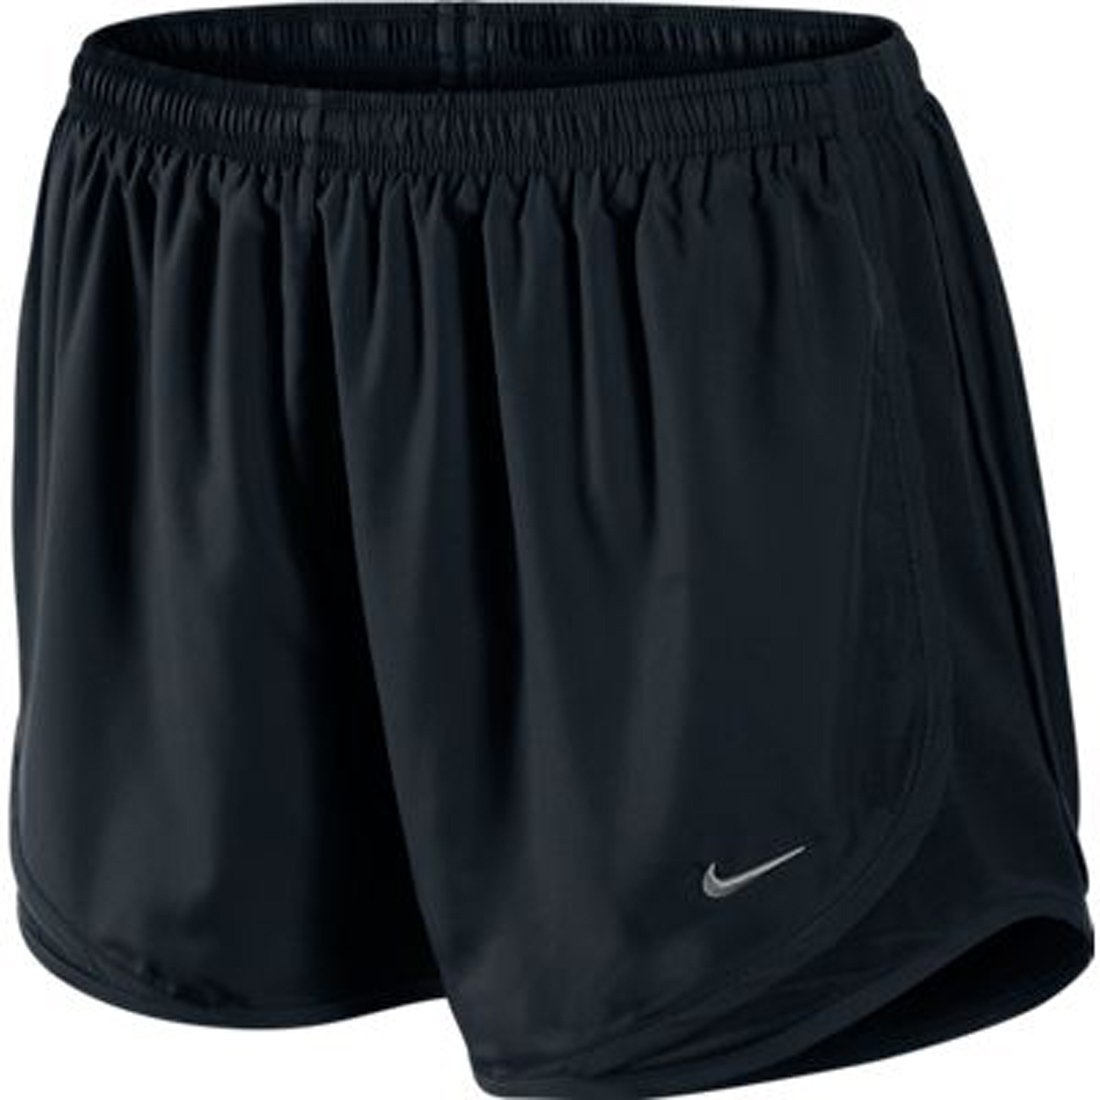 Amazon.com: Nike Lady Tempo Running Shorts - X Small - Black: Clothing